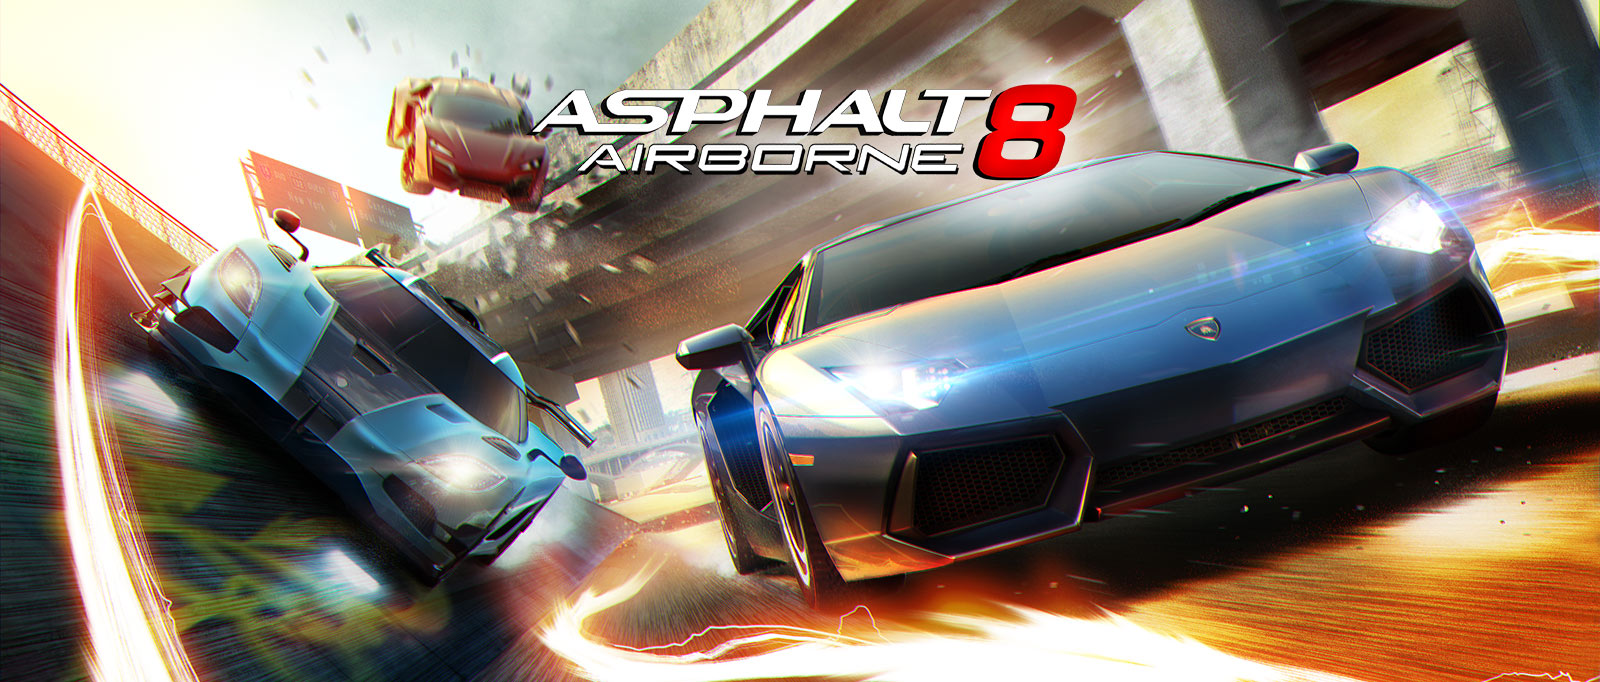 Asphalt 8|Best games on play store